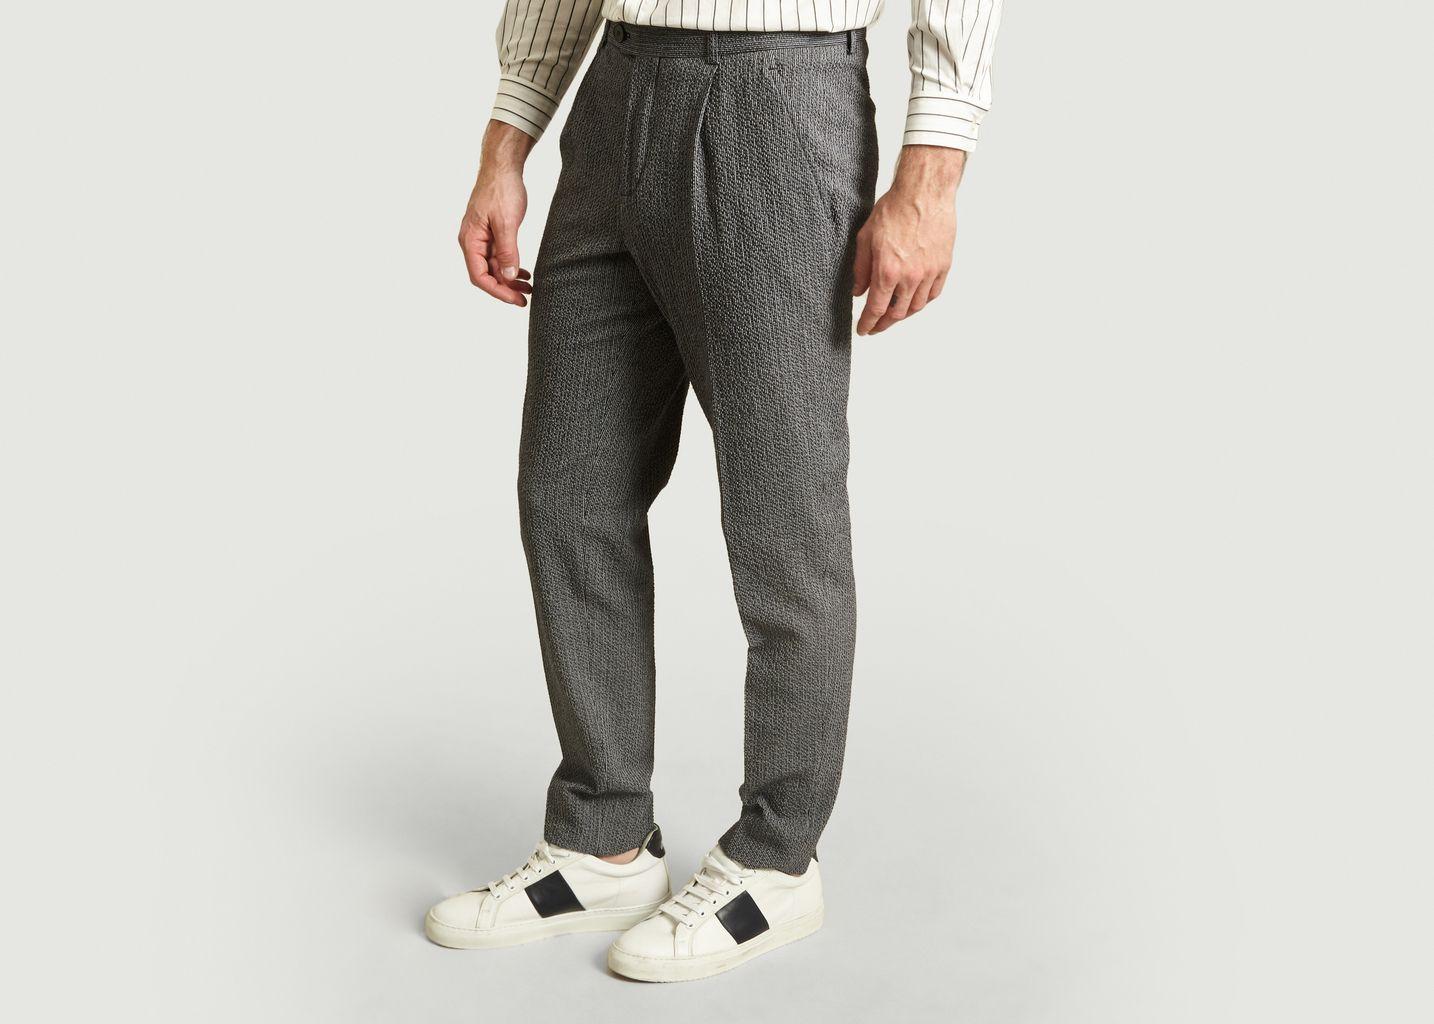 Pantalon François en Seersucker - Editions M.R